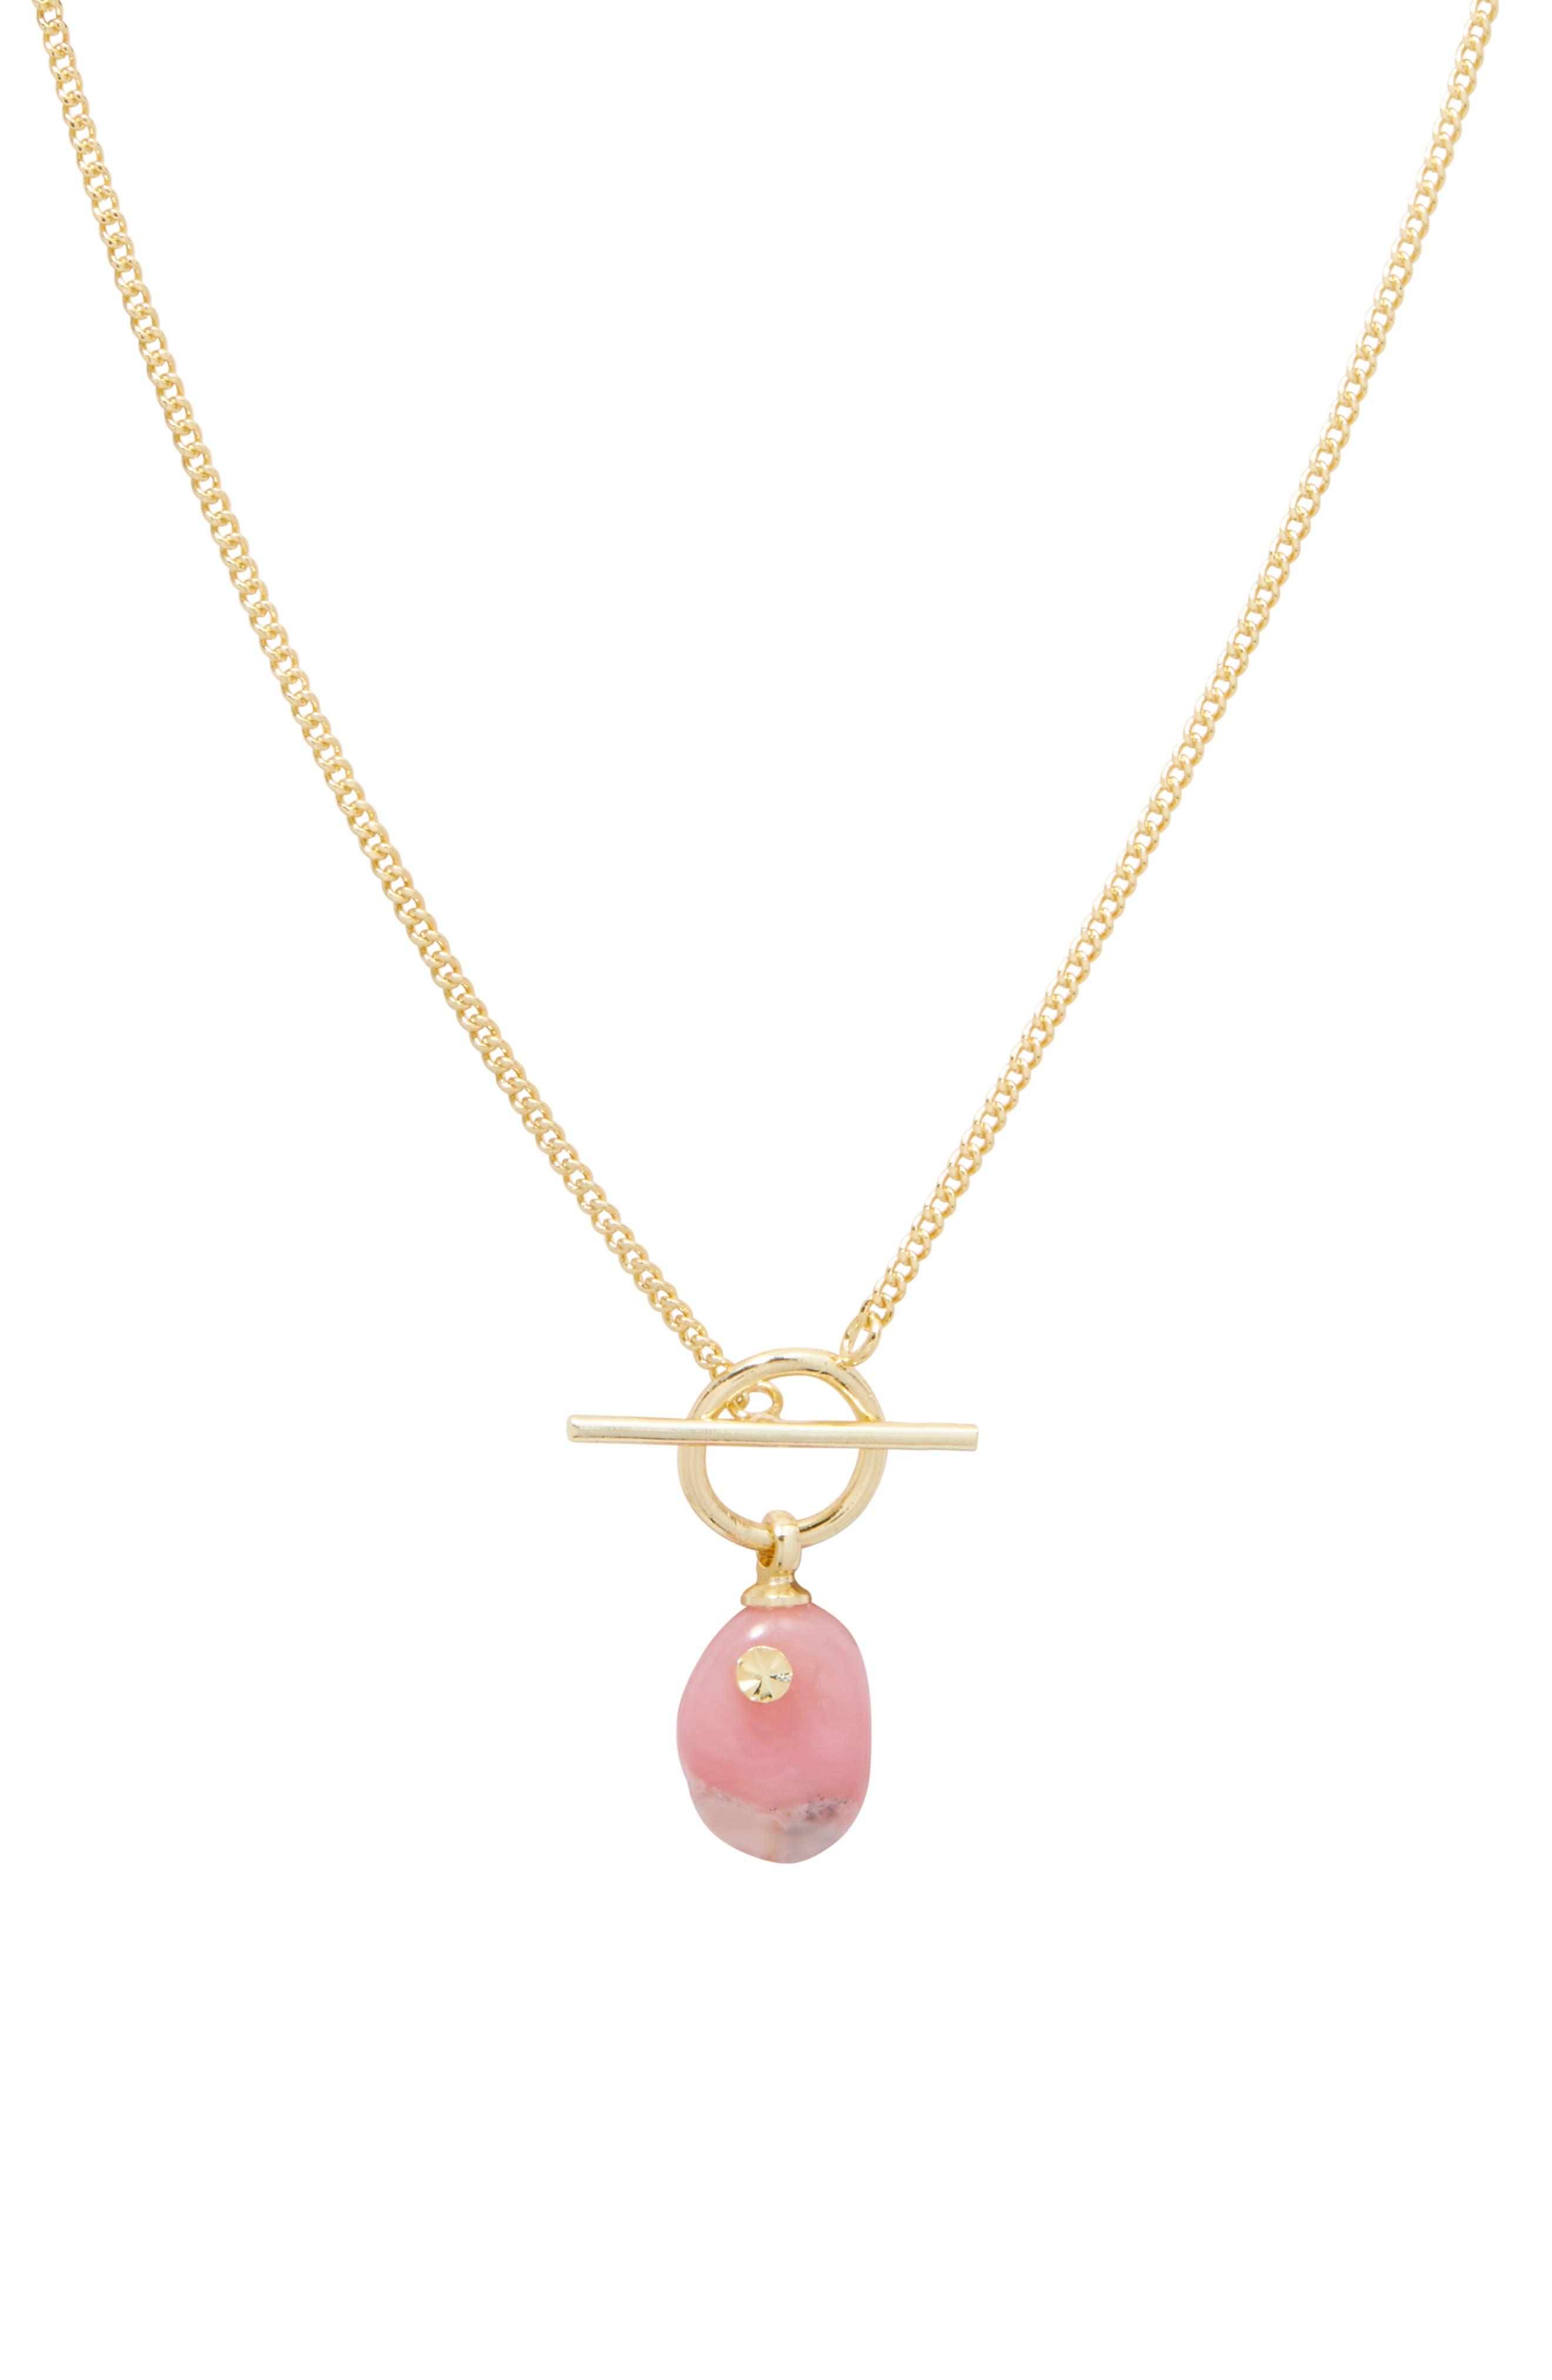 Alice Gem Pink Opal Toggle Necklace